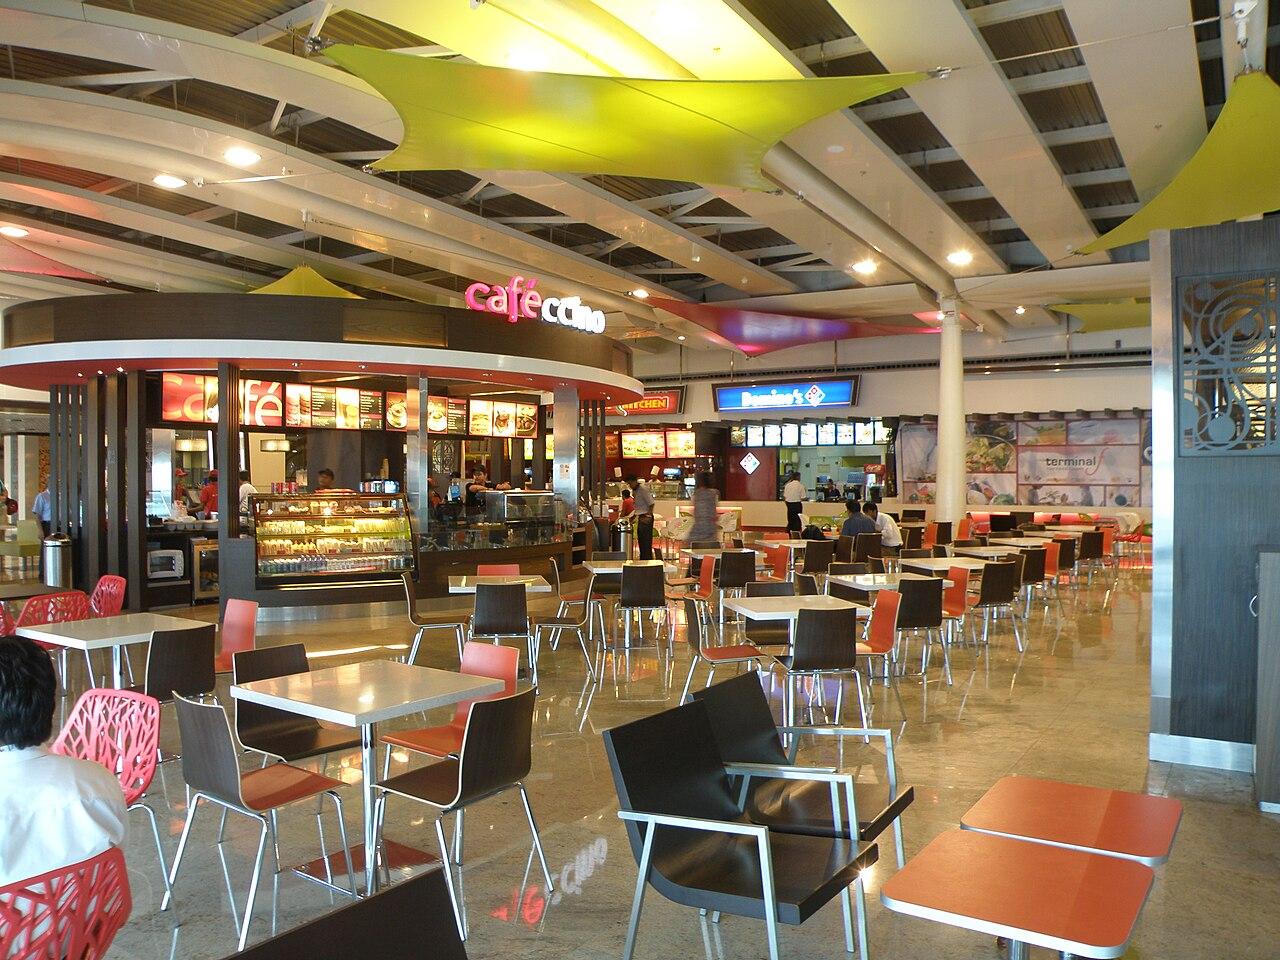 FileTerminal Food Court Between Terminals 1A And 1C At